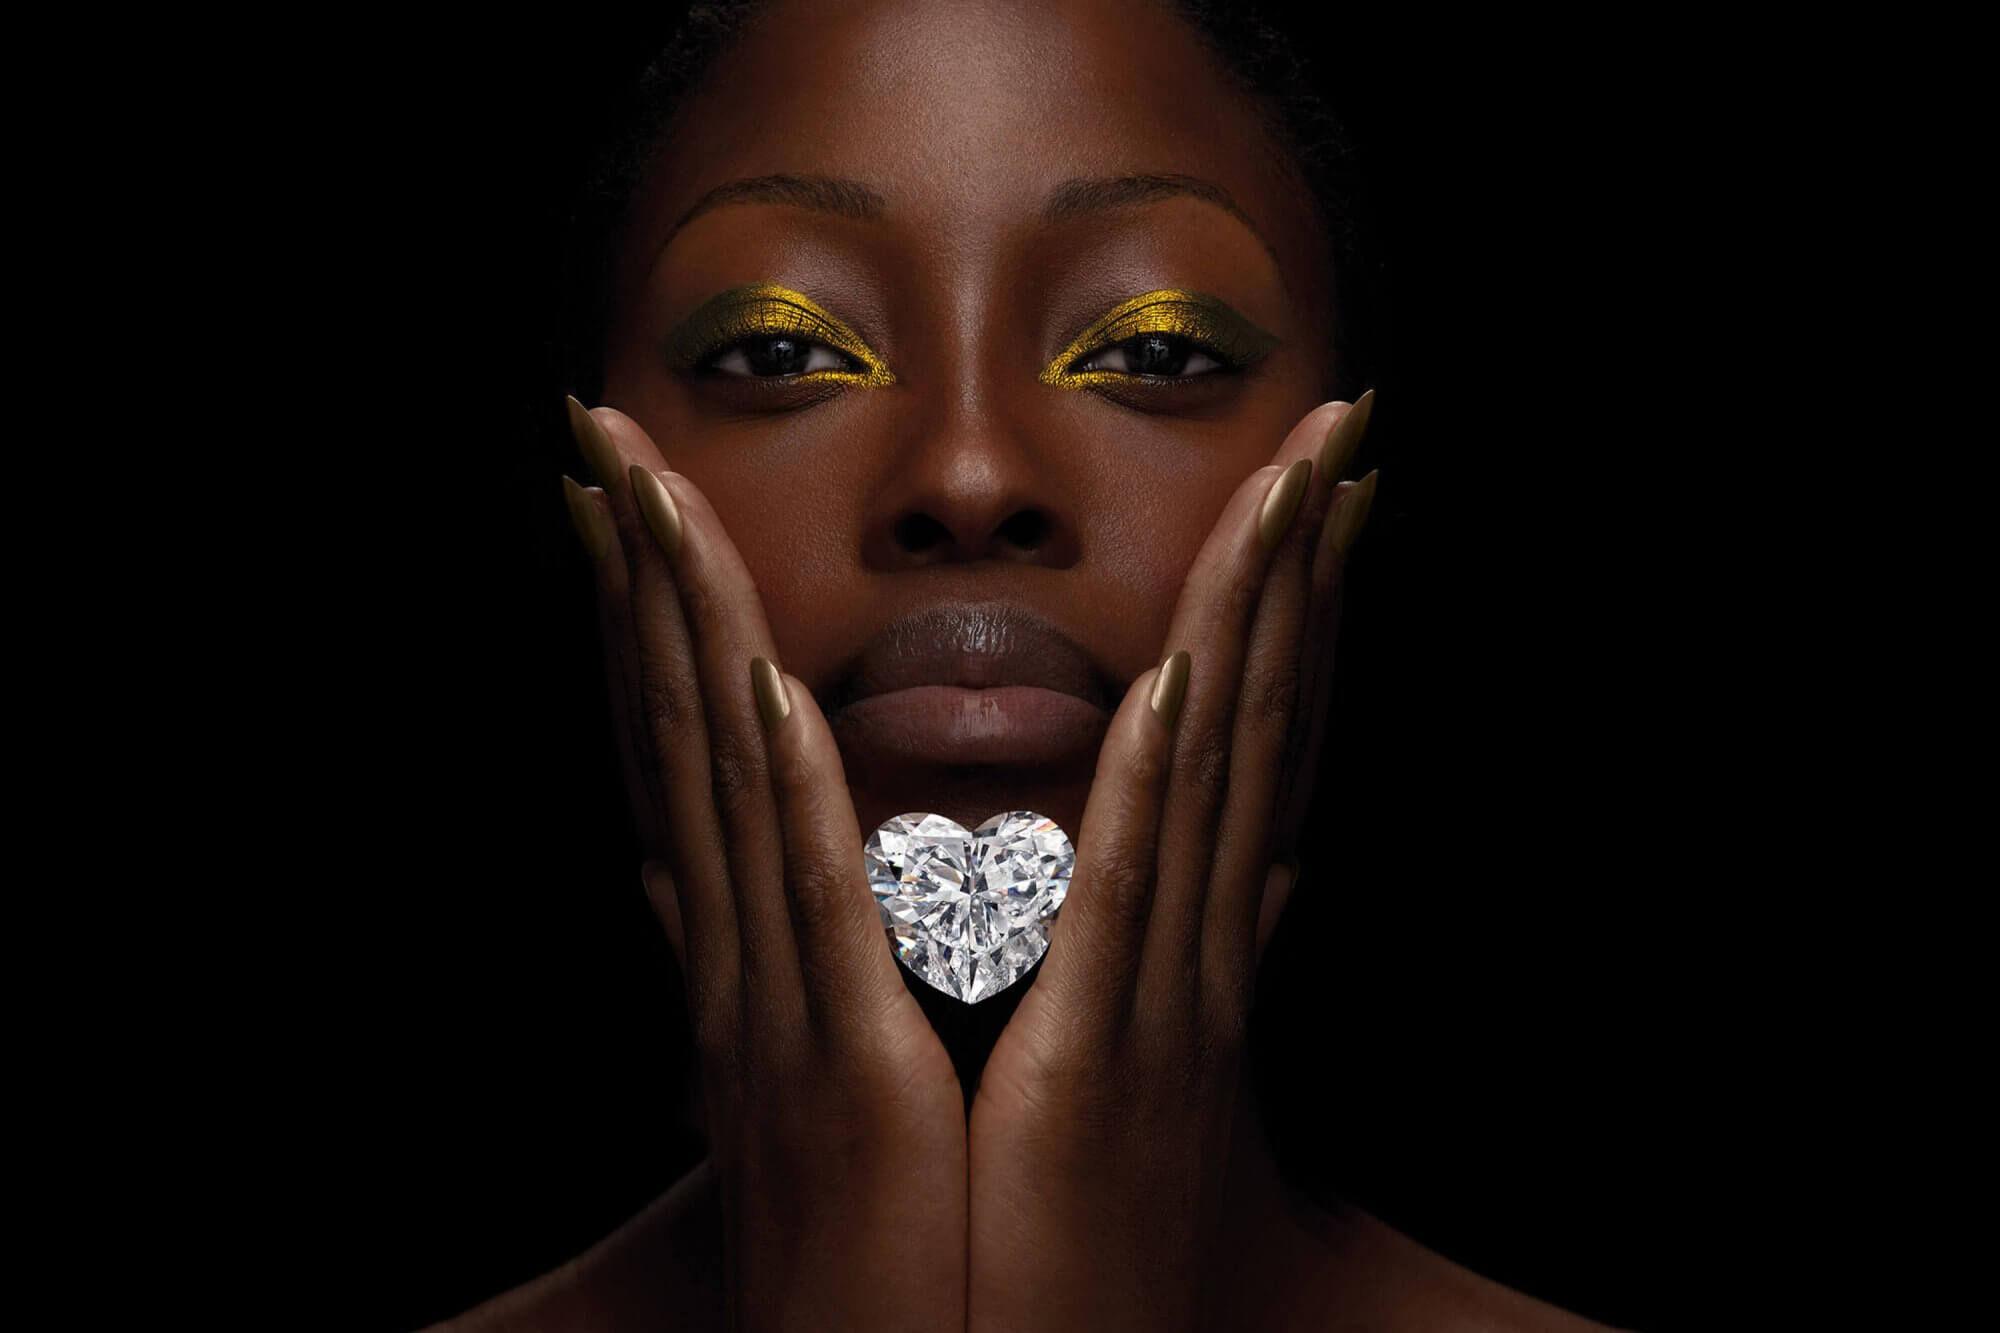 Model holding the famous heart shape Venus diamond by Graff